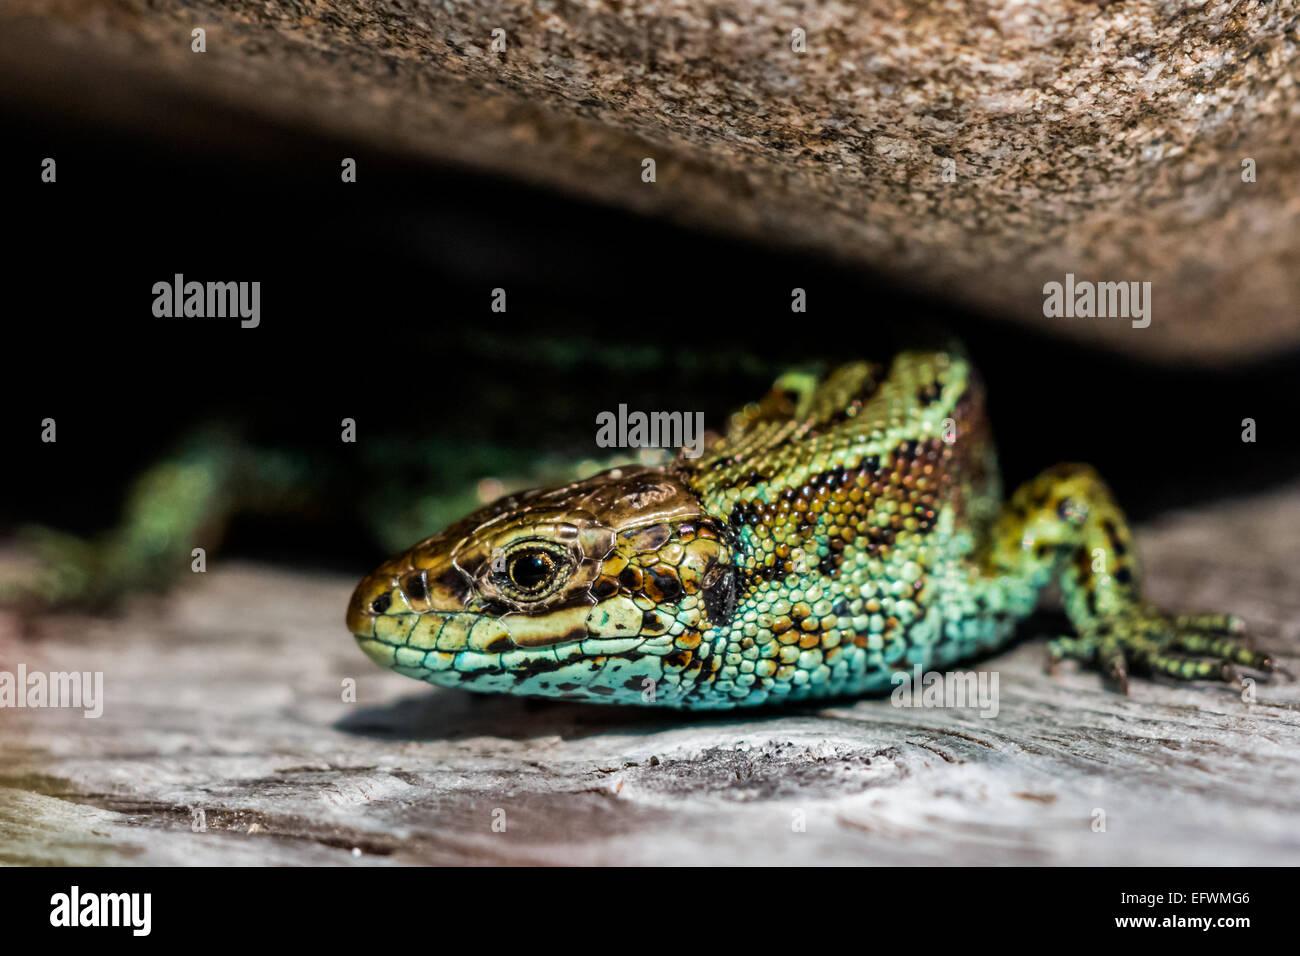 Vivipare Smaragdeidechse (Zootoca Vivipara) Stockfoto